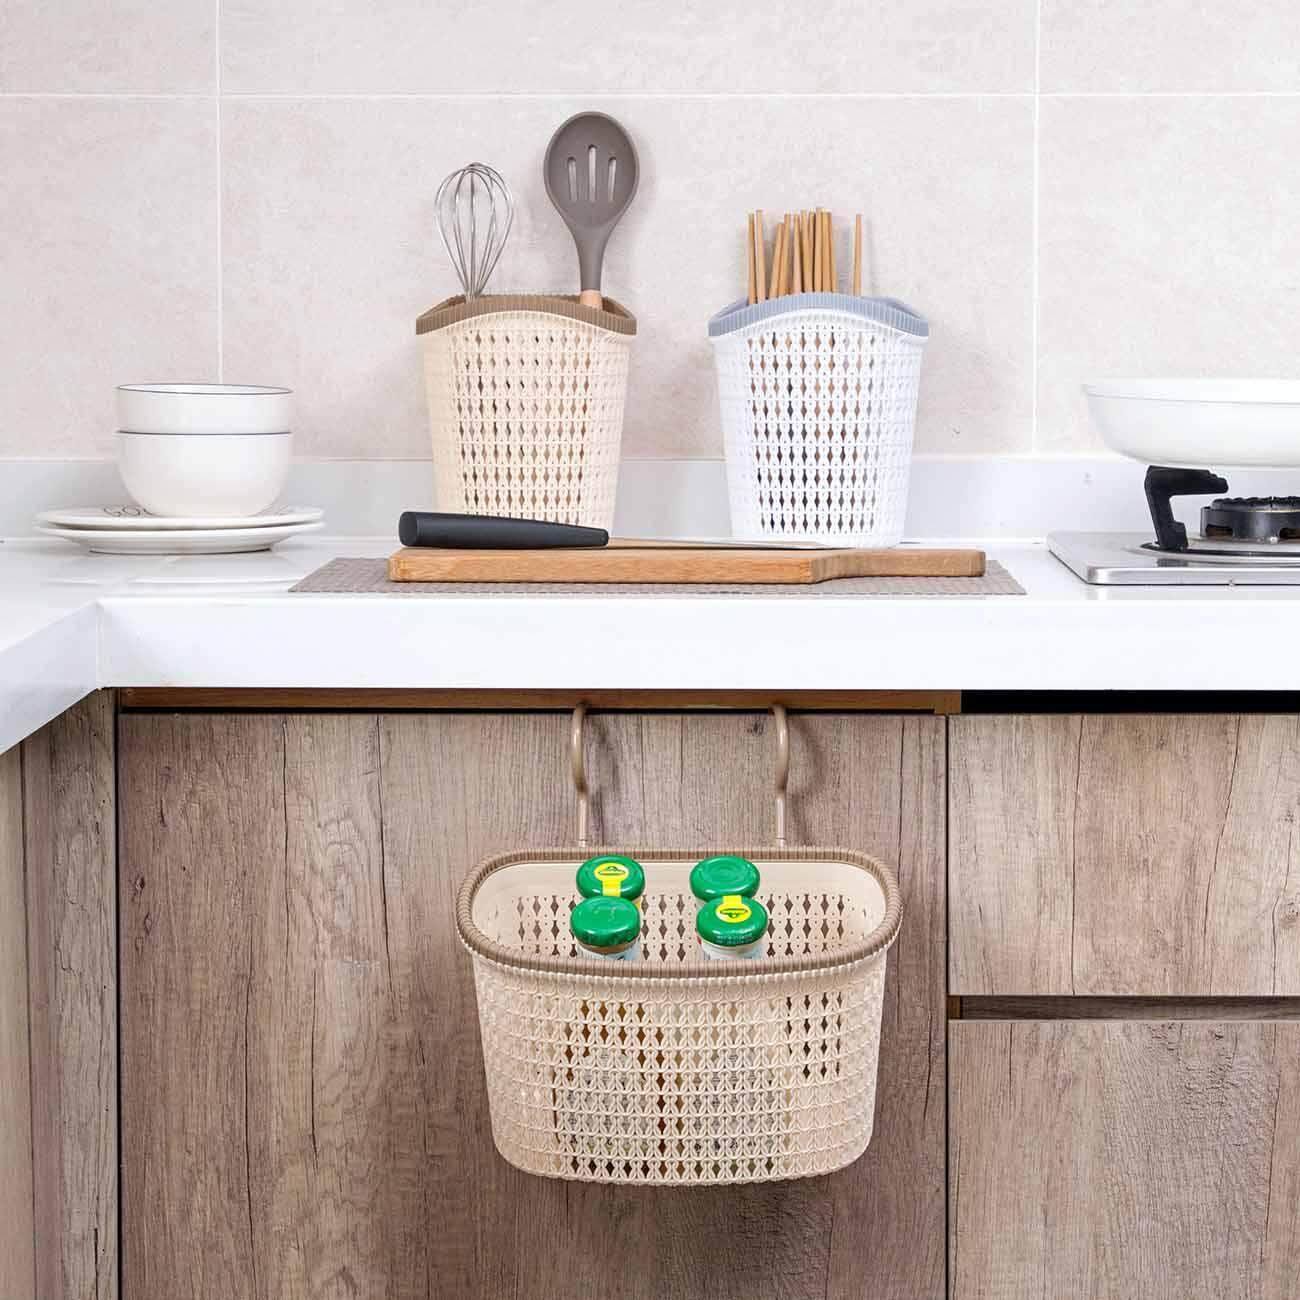 Mitation Rattan Storage Basket Punch-Free Bathroom Hanging Basket Bathroom Wall Hanging Rack